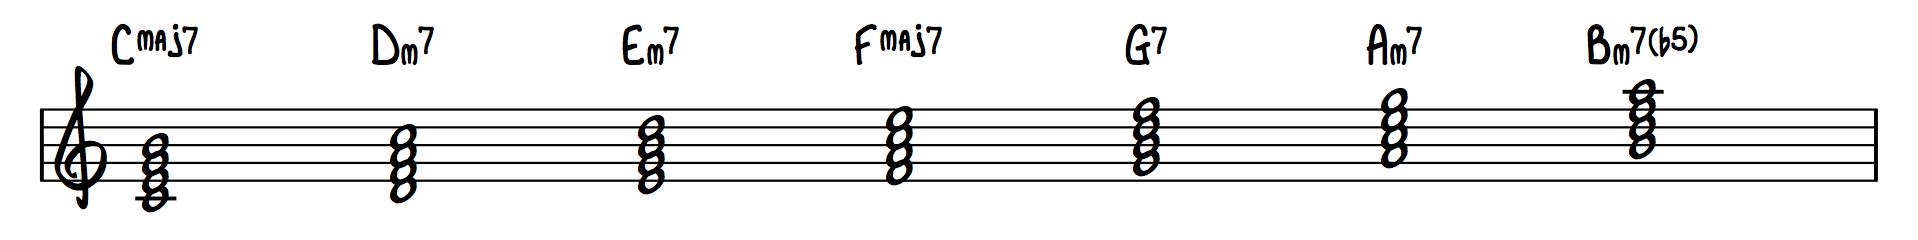 2 - C Major Chords